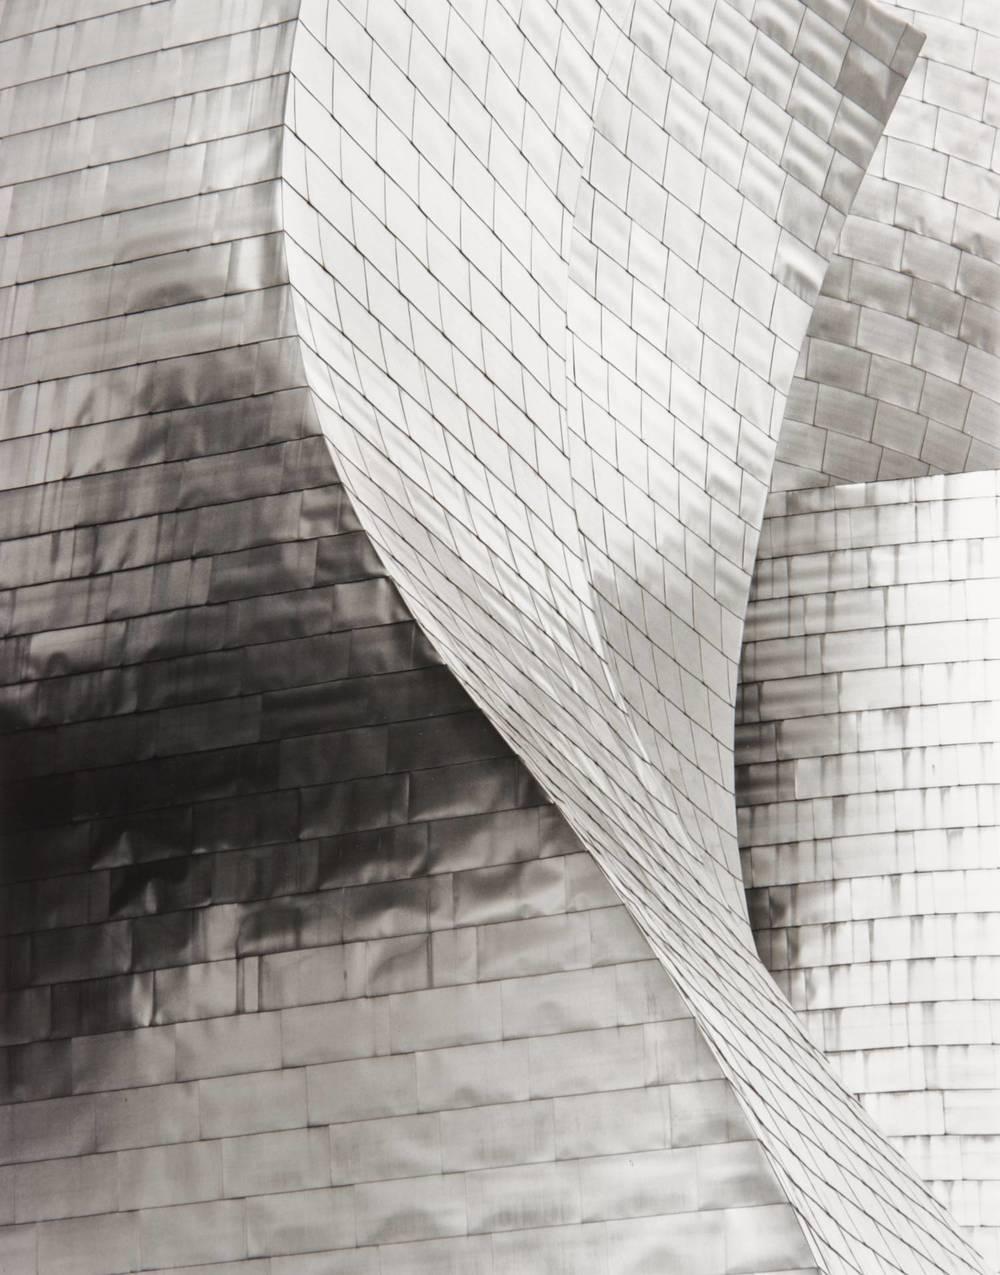 Guggenheim Curve (Bilbao, Spain)